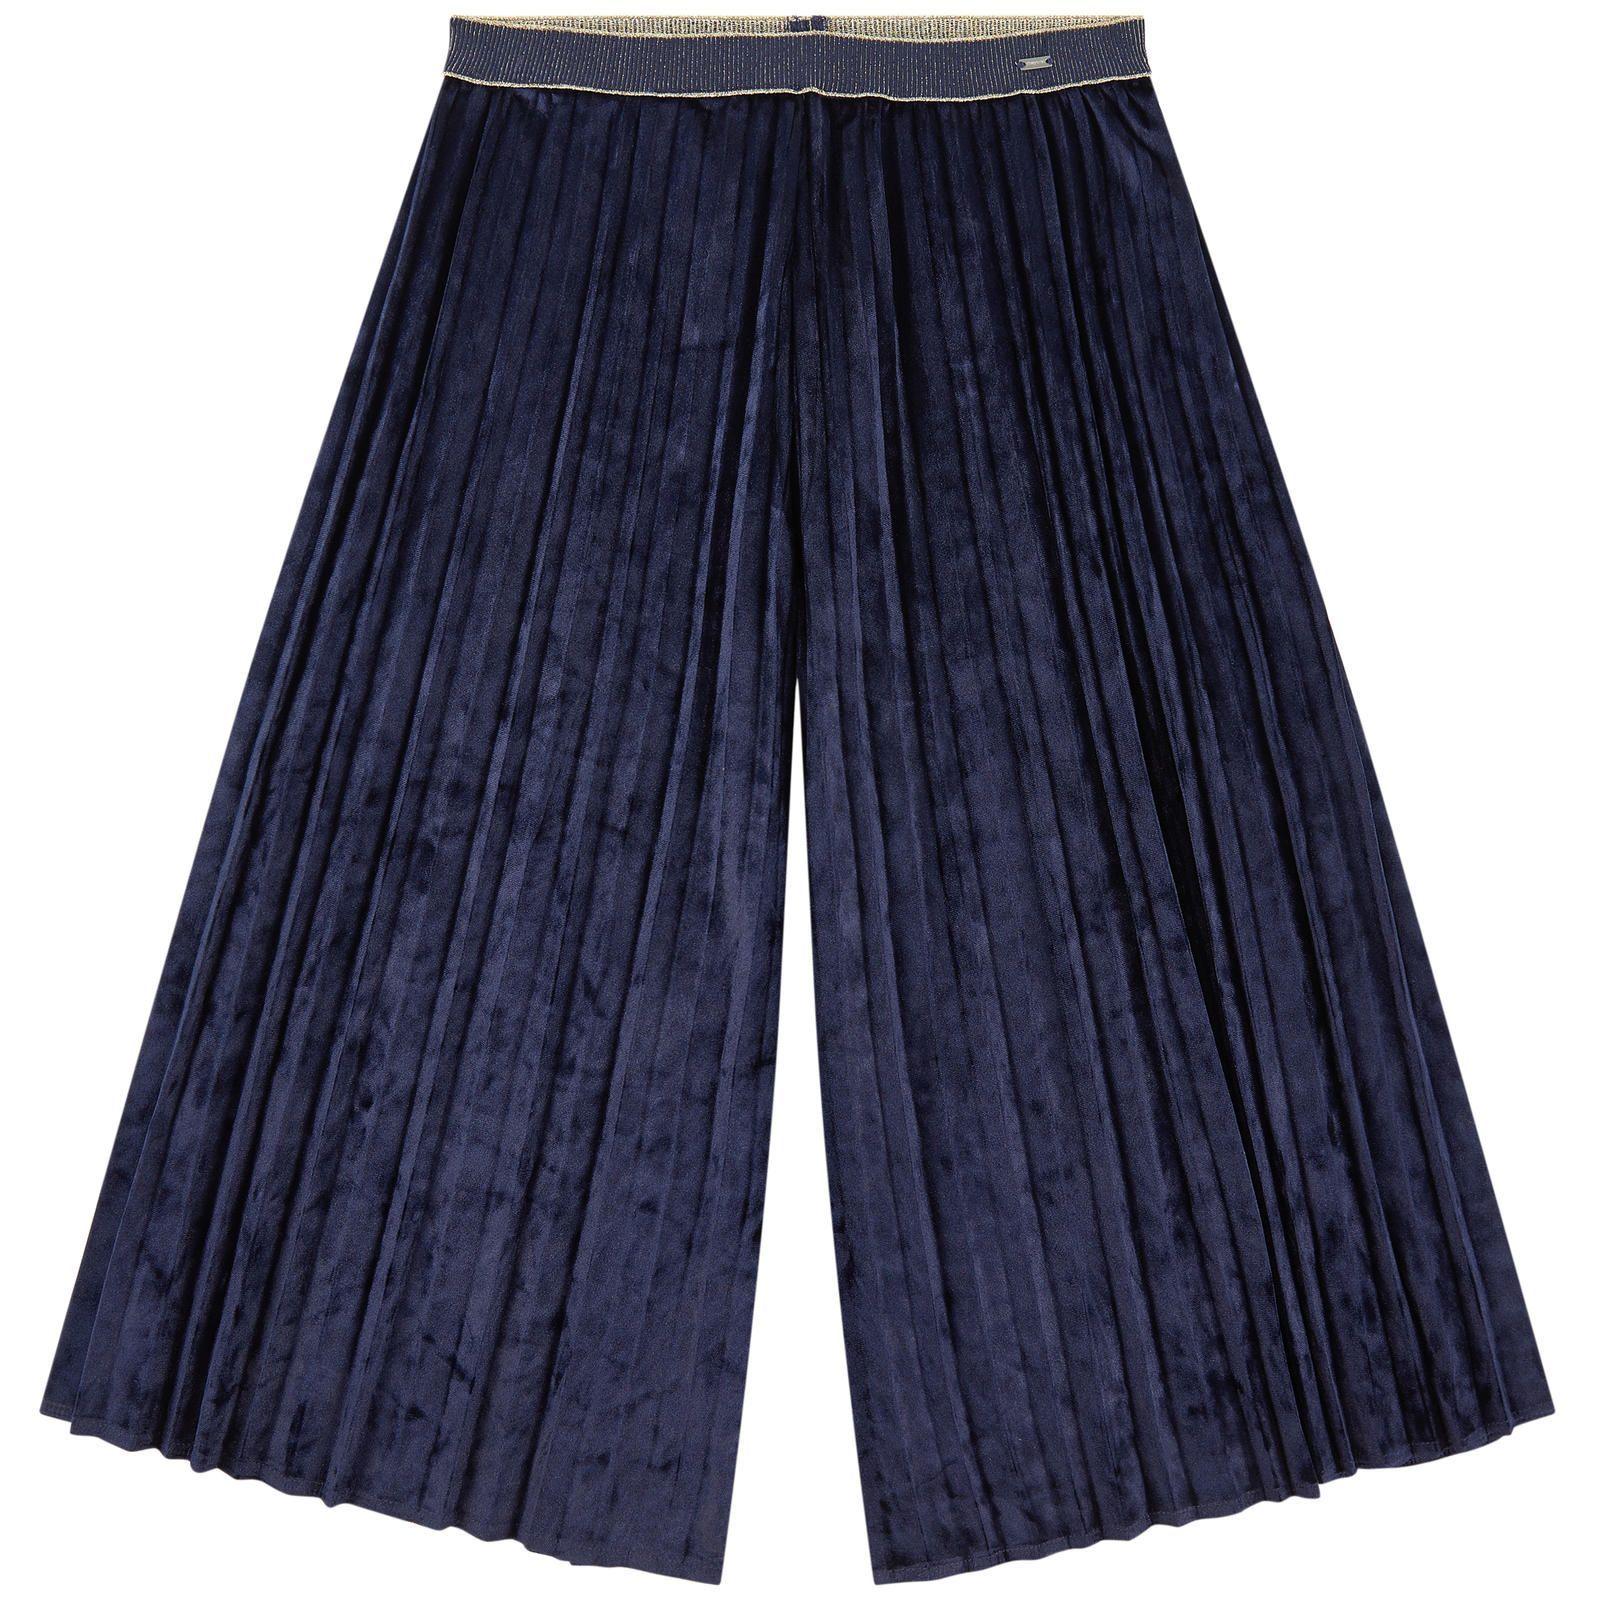 Pantalon jupe-culotte en velours Mayoral Bleu Velours : 95% Polyester 5% Elasthanne Lavage en machine à 30°C